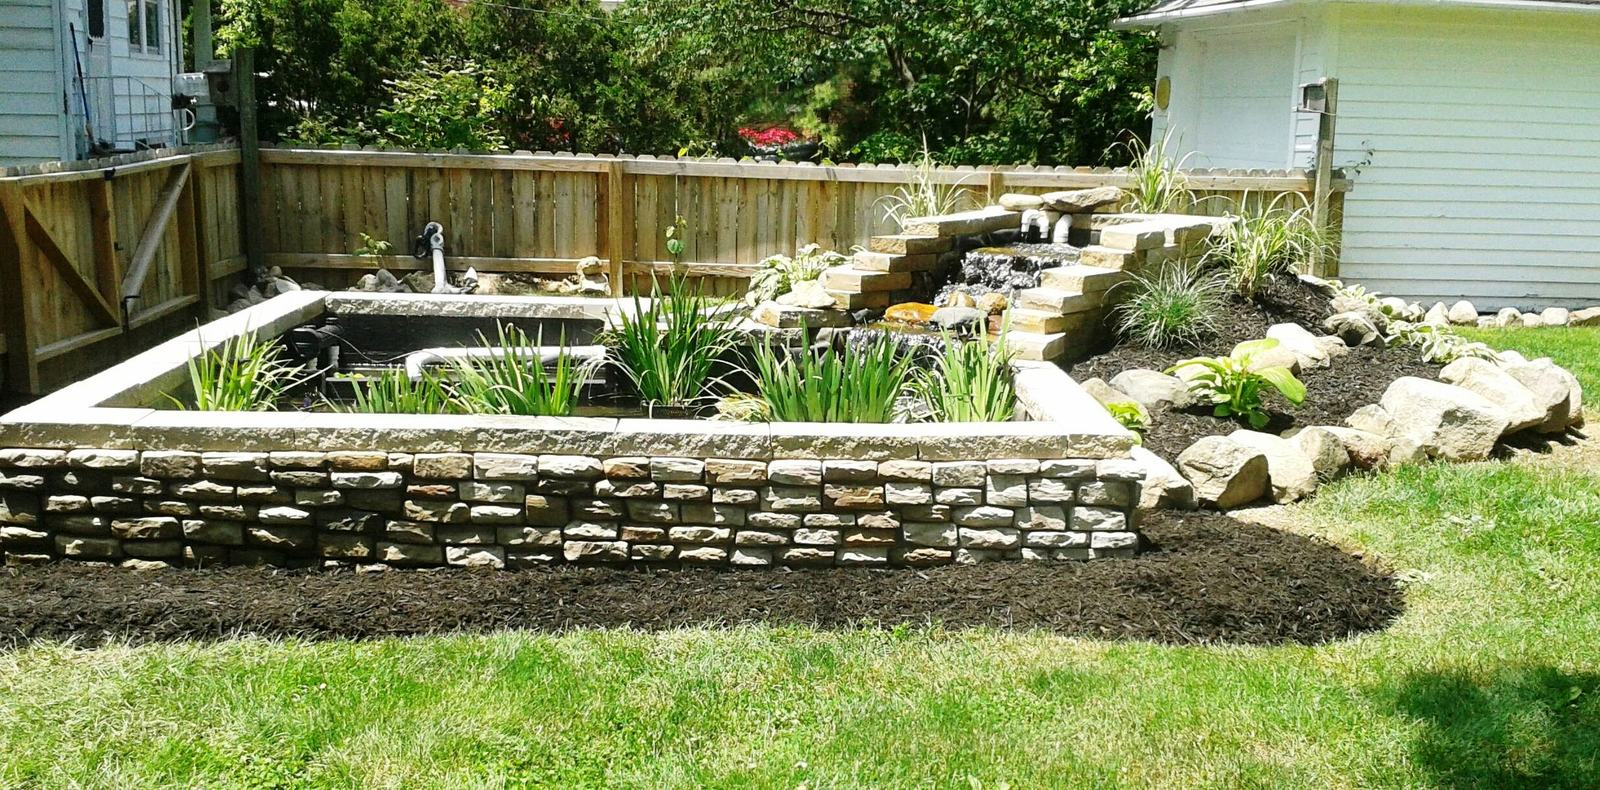 #OKL-01K Limestone Concrete Mold & Supplies Kit (9) Make 100s Rock Stone Veneer